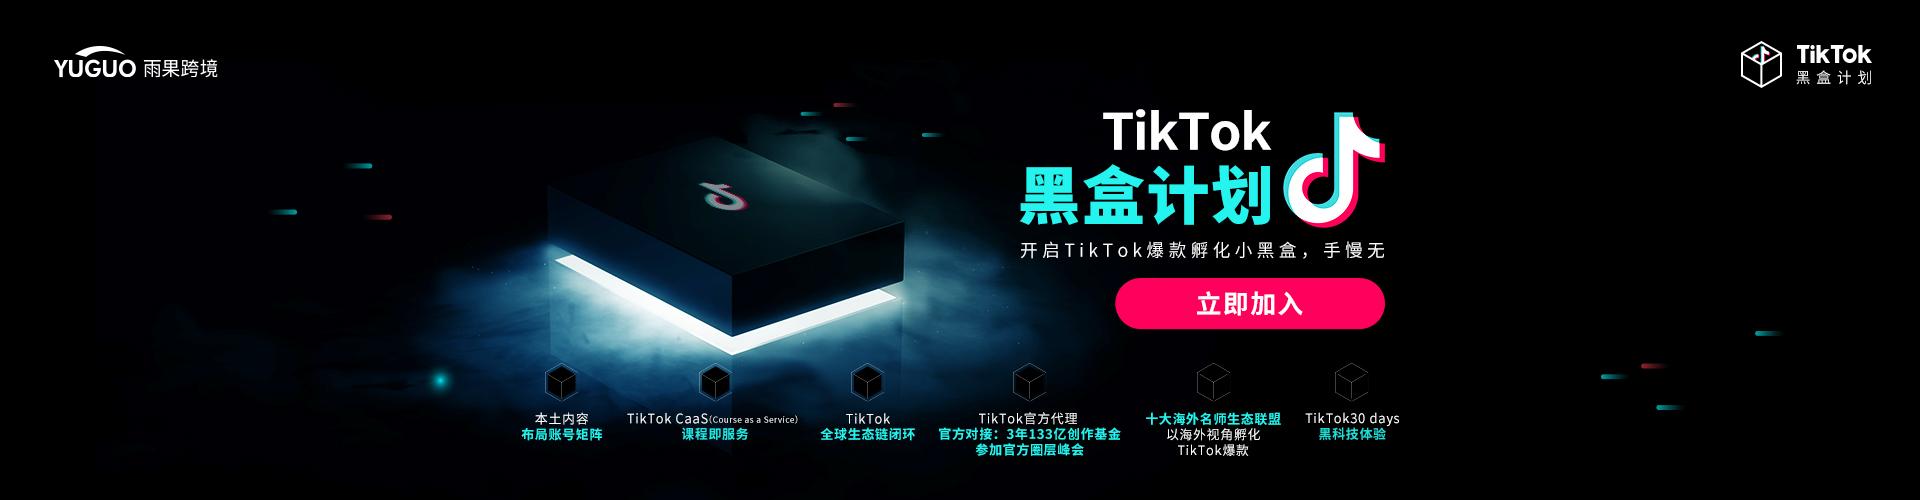 TikTok黑盒计划-开启TikTok爆款孵化小黑盒,手慢无